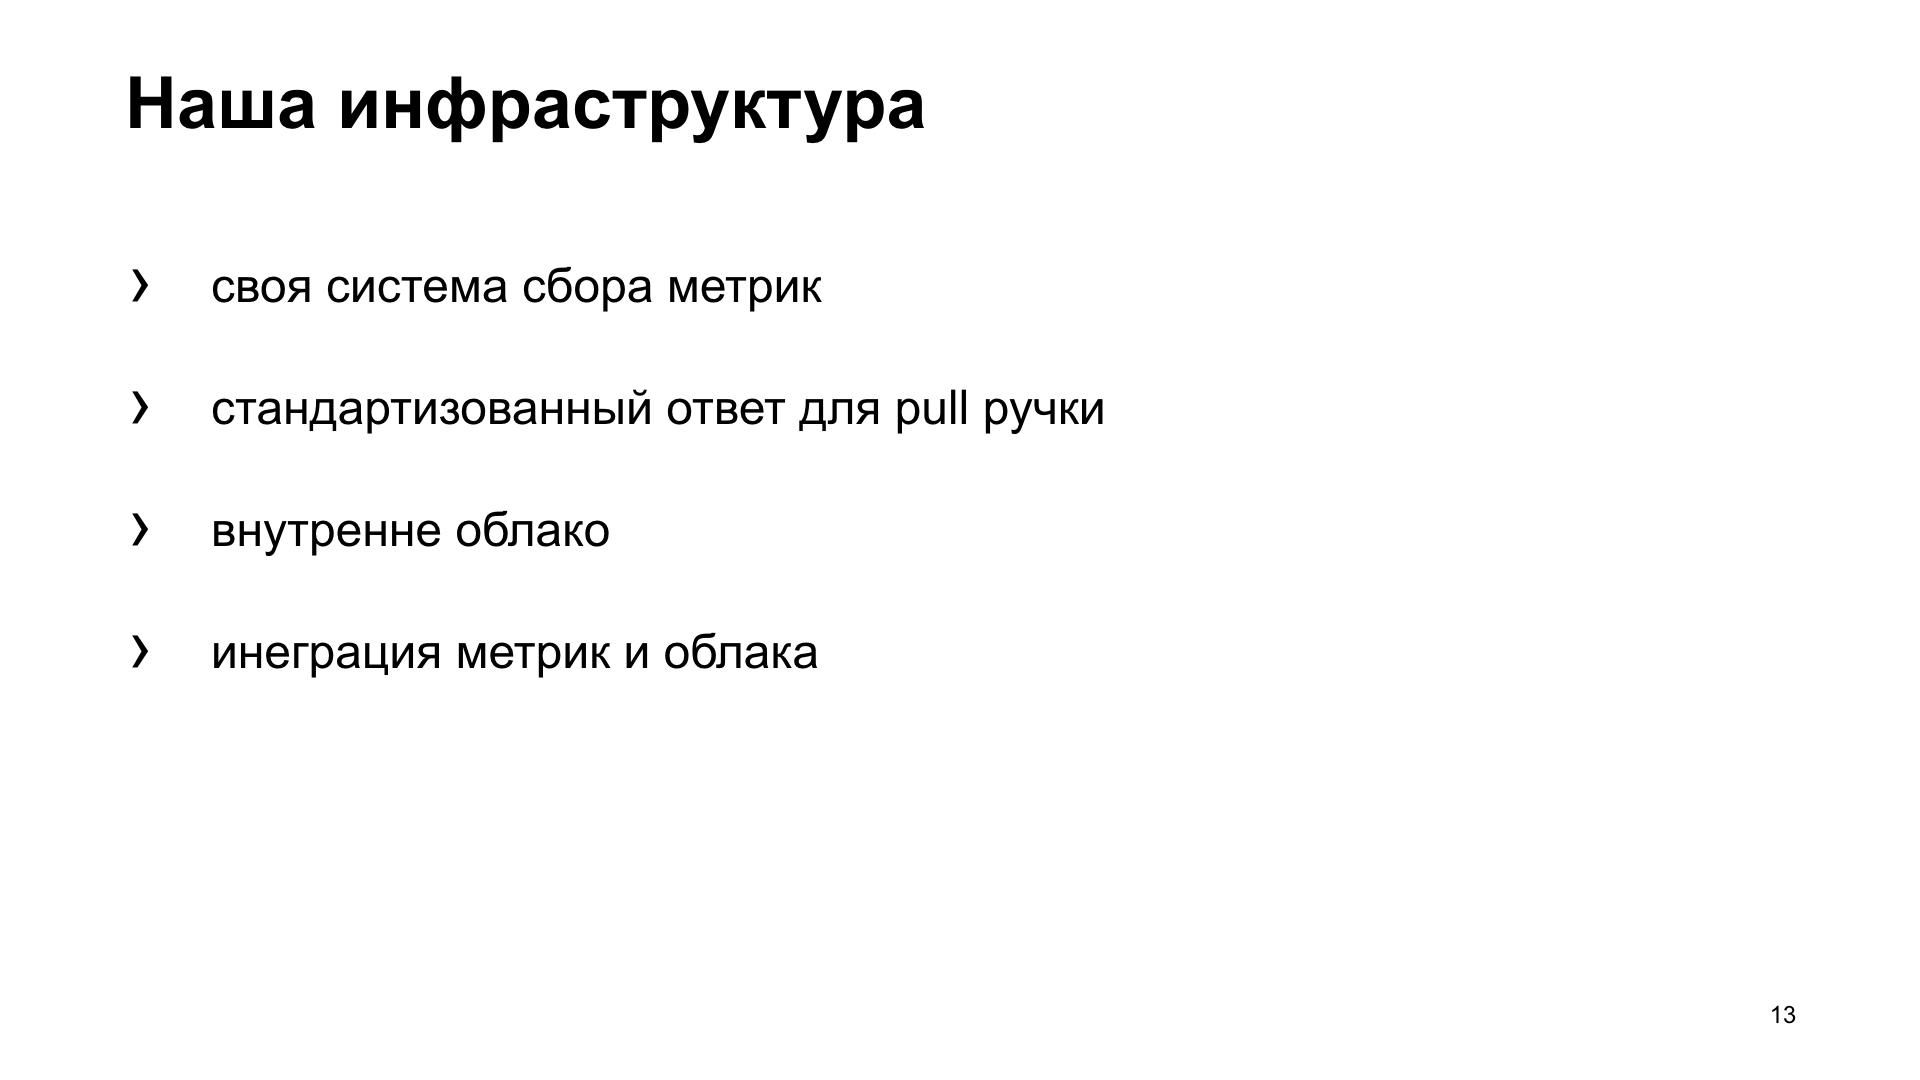 uWSGI в помощь метрикам. Доклад Яндекса - 8